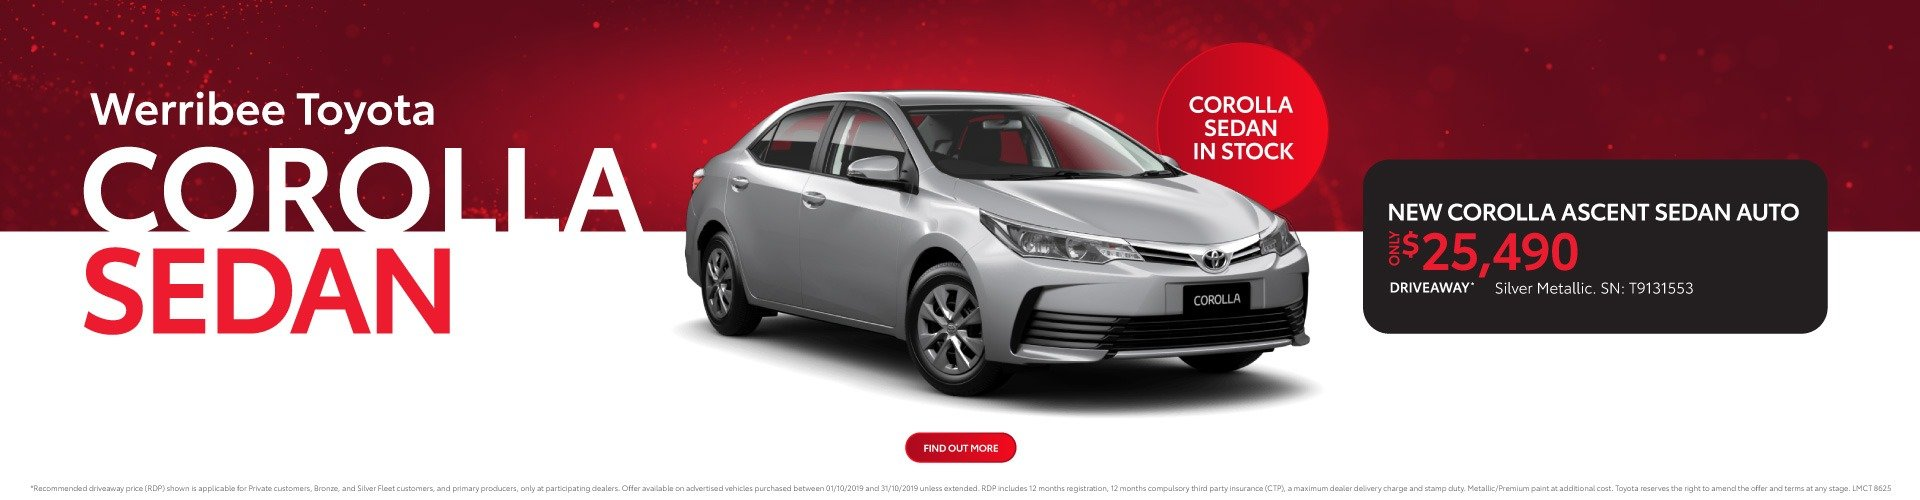 Werribee Toyota - Corolla Sedan